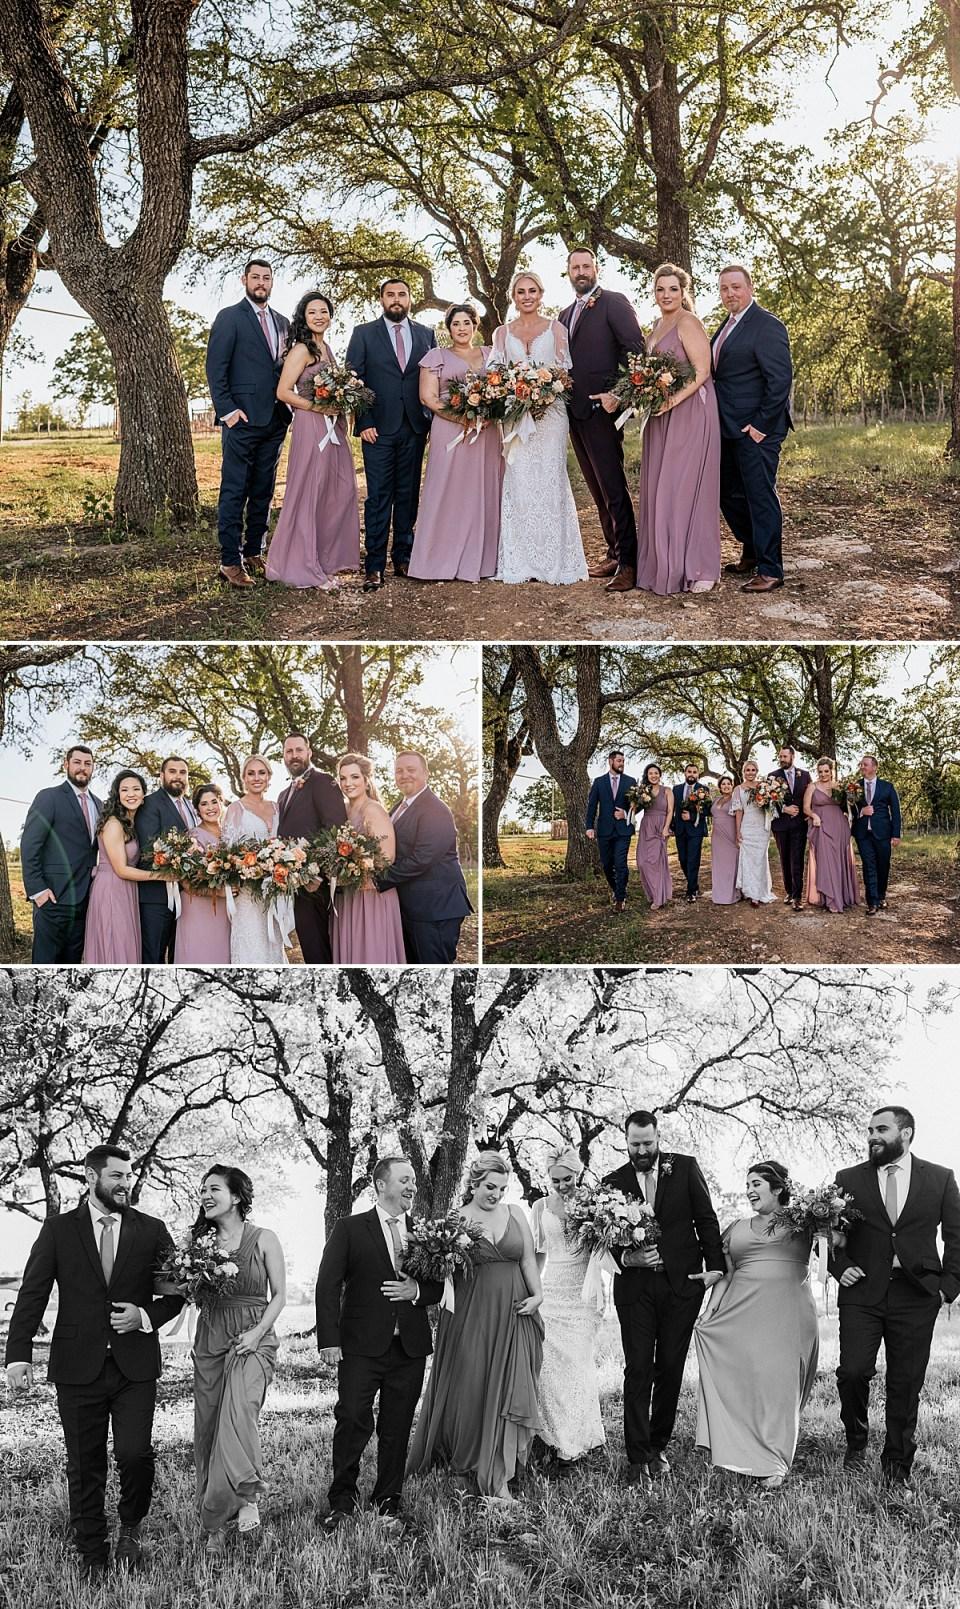 wedding party photos at weatherford texas wedding at lazy s hacienda